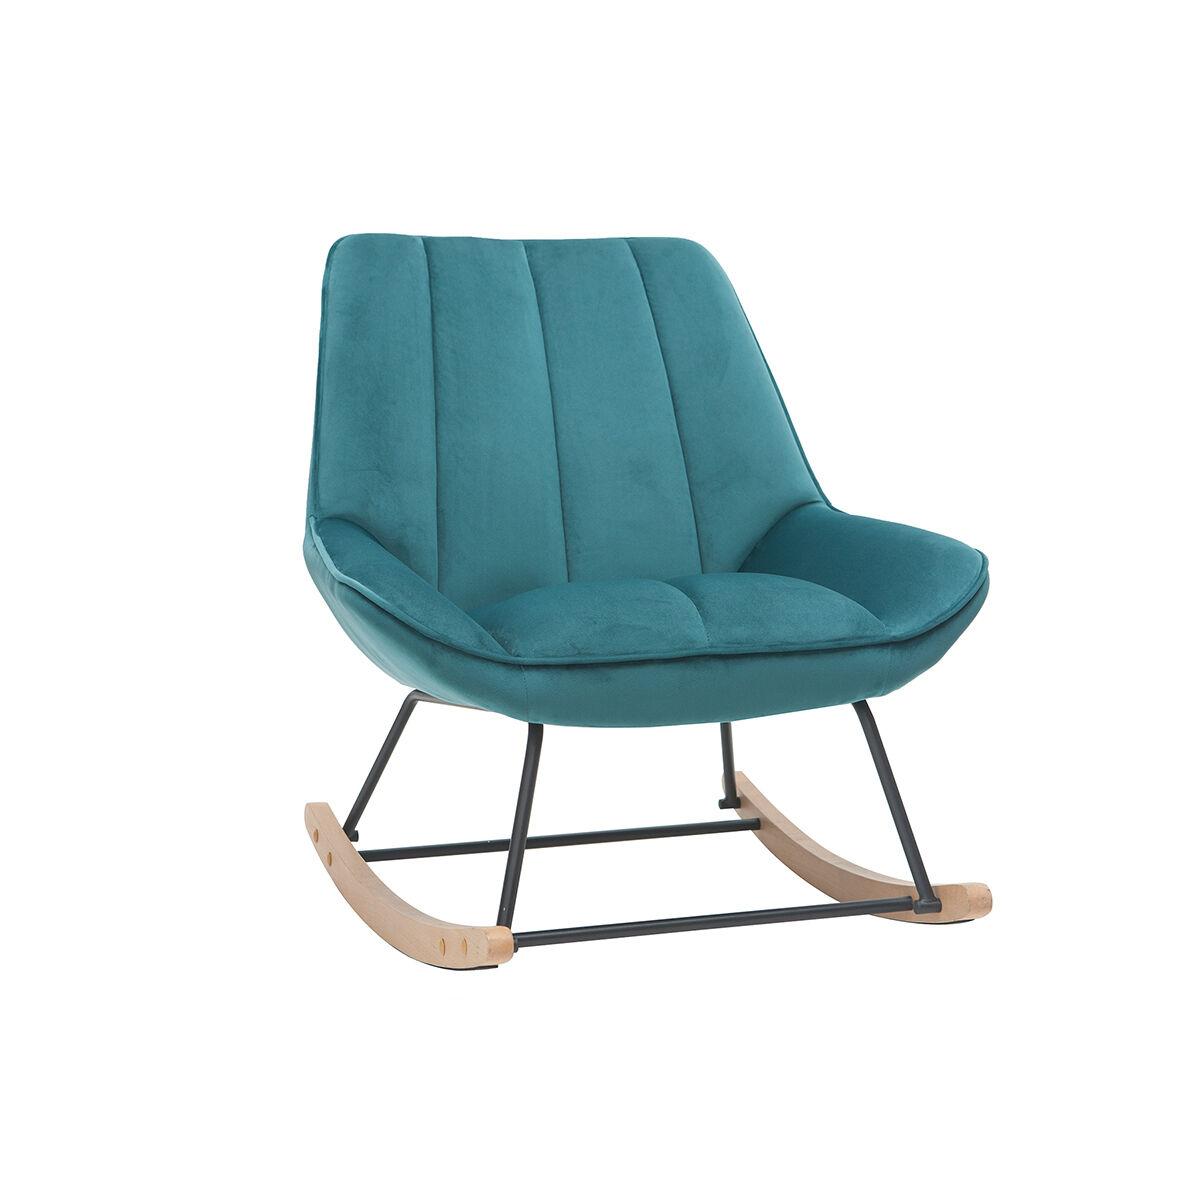 Miliboo Rocking chair design en velours bleu pétrole BILLIE